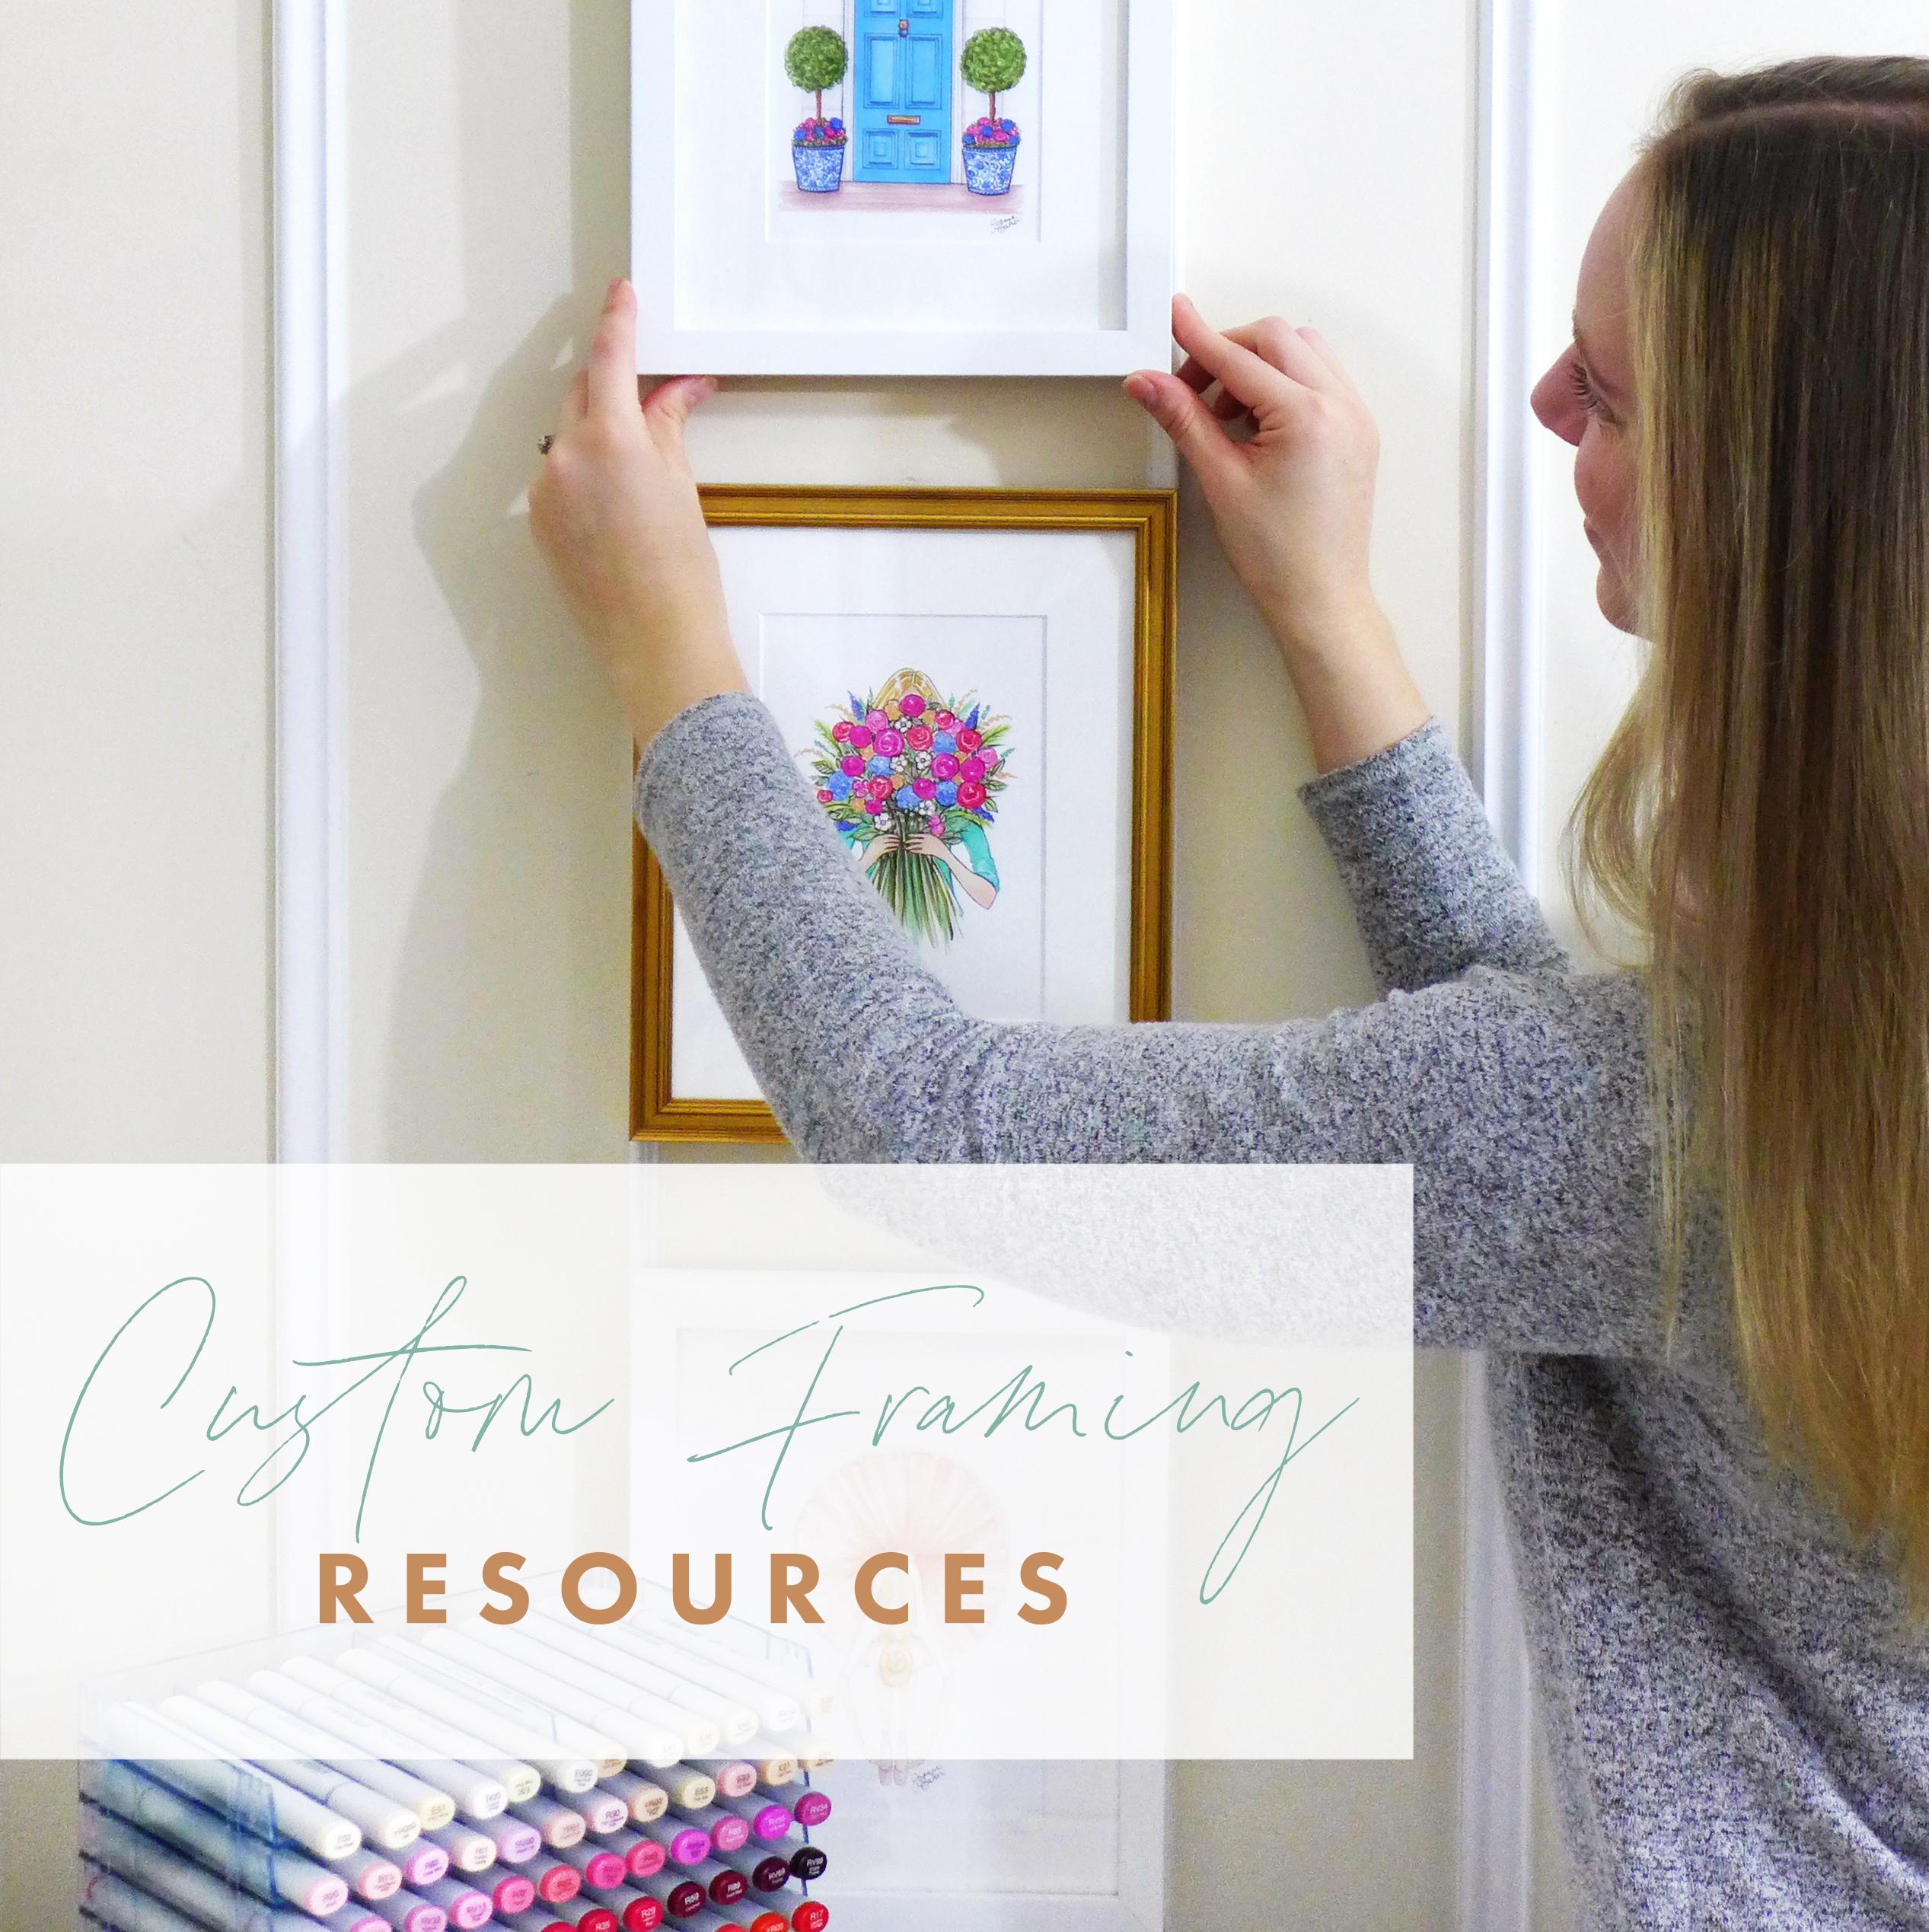 Custom Framing Resources by Joanna Baker